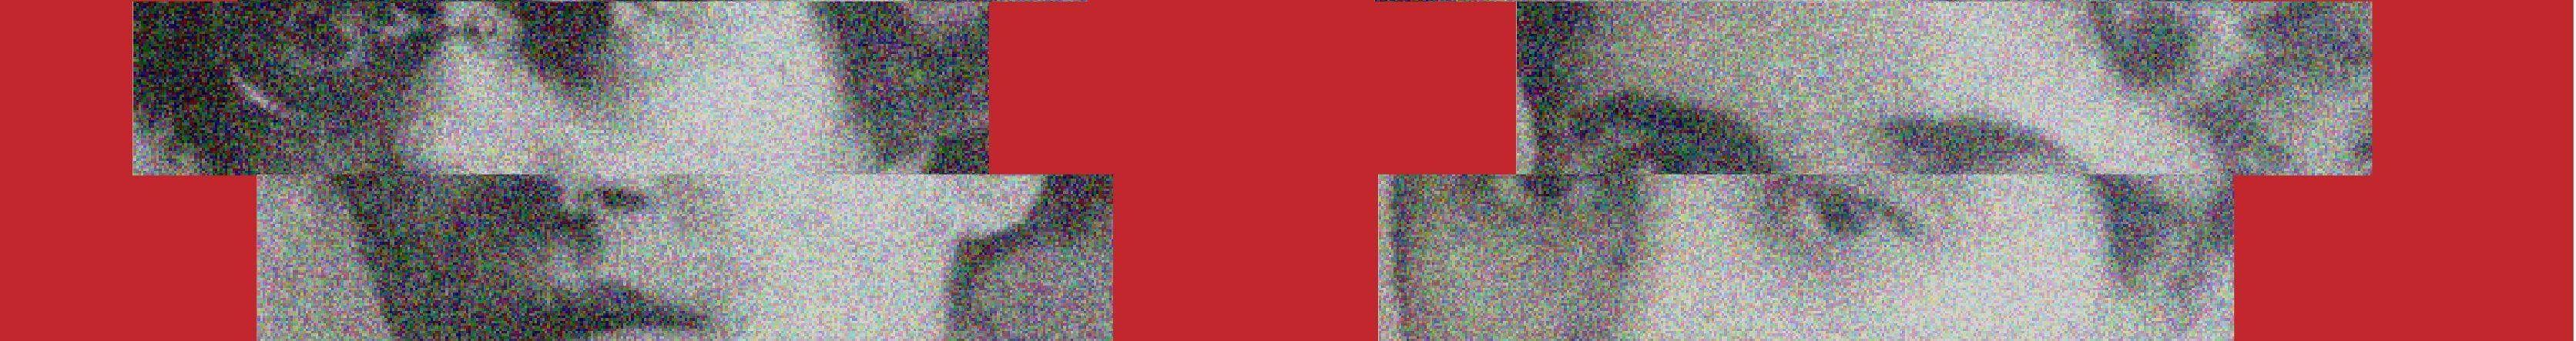 albanianfeminism-01